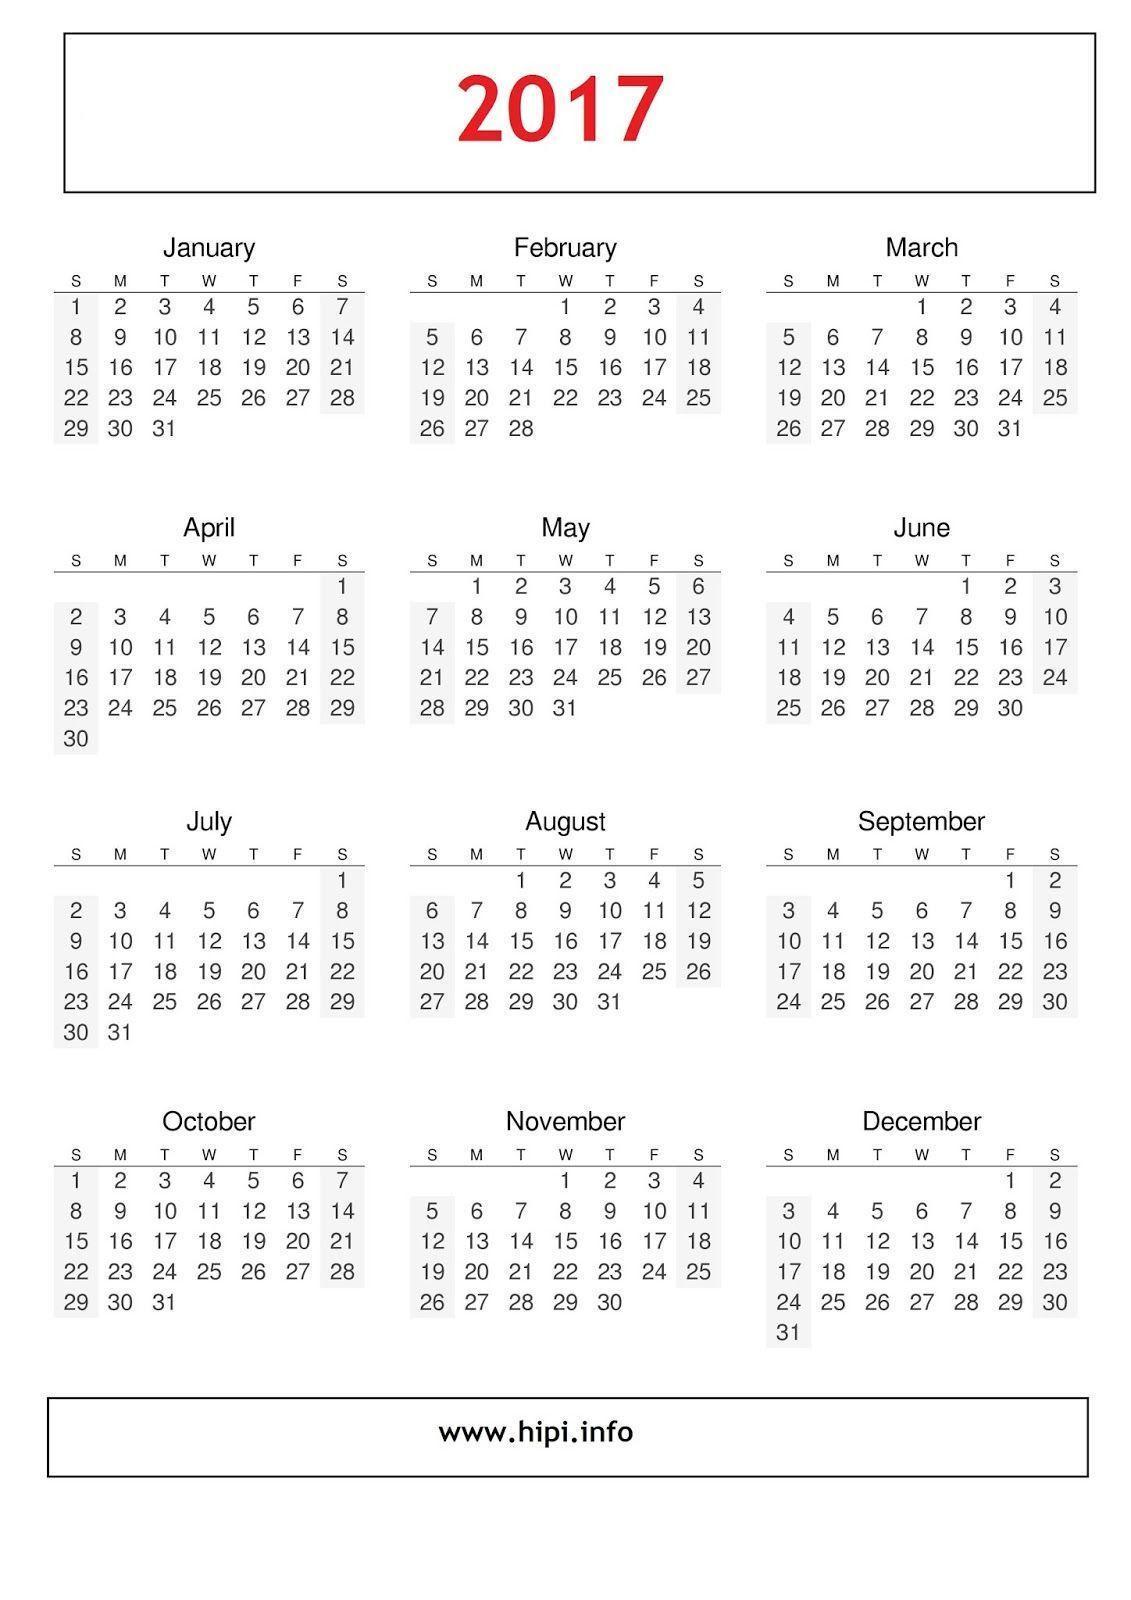 Calendars: 2017